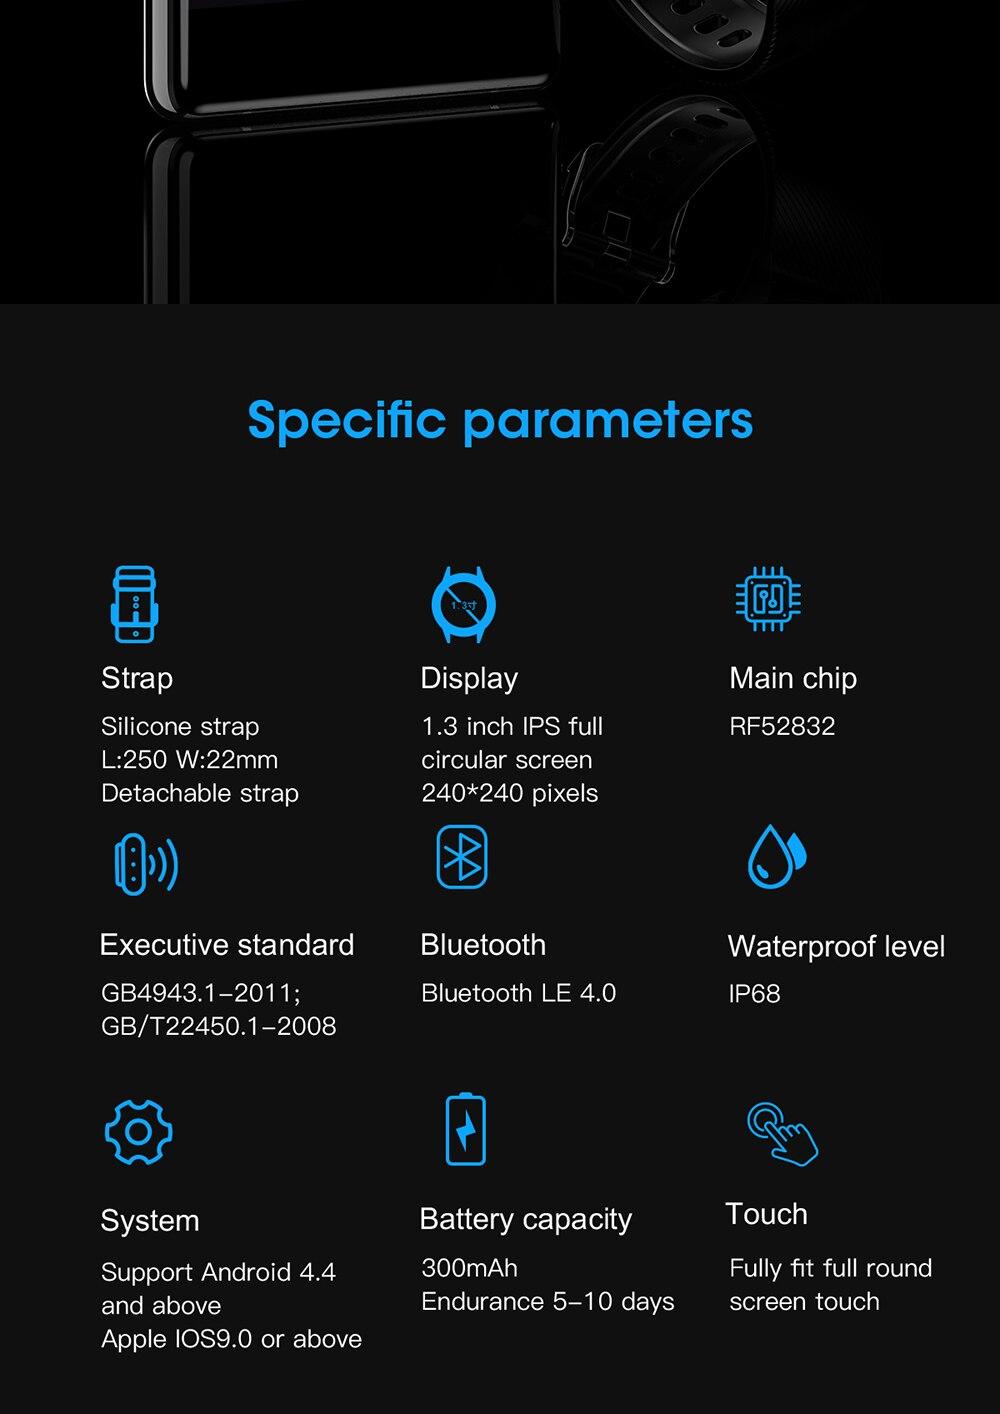 H193fe0c729cf4d1d9cef7db91c19d6110 696 L9 Full touch Smart Watch Men ECG+PPG Heart Rate Blood Pressure oxygen Monitor IP68 Waterproof Bluetooth Smart Bracelet